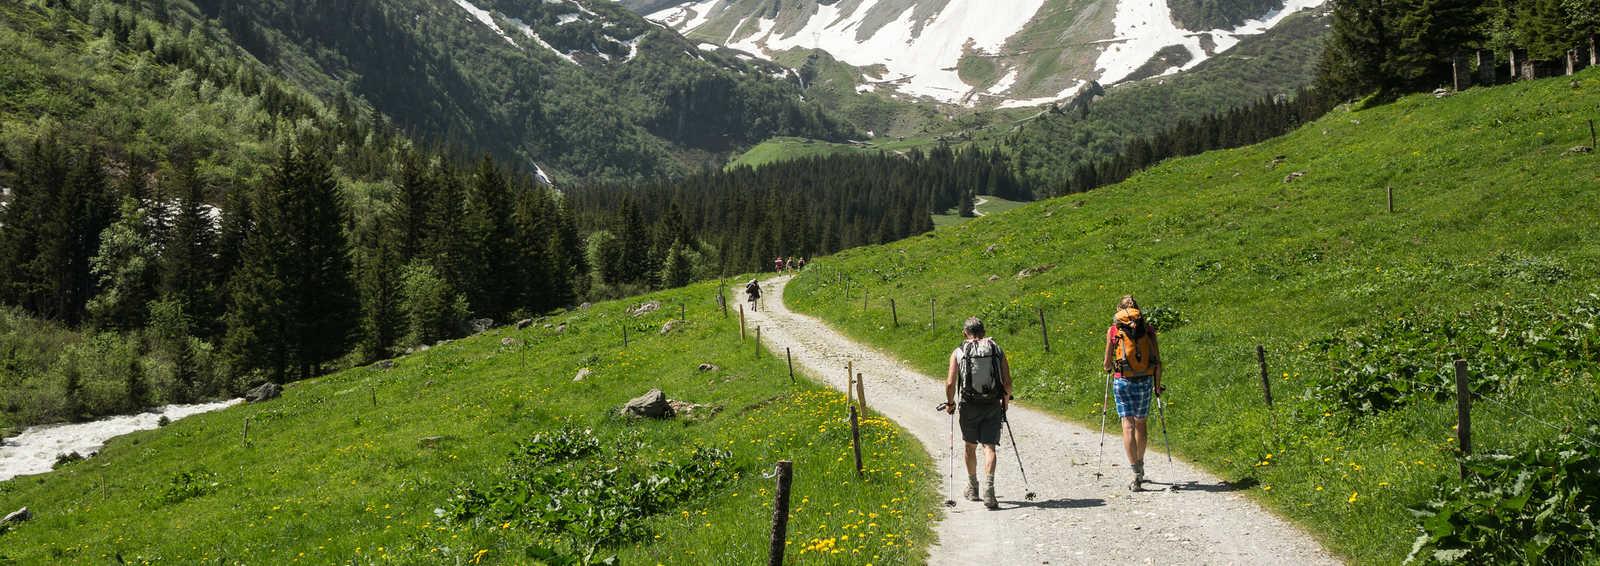 Trekking in the Alps, Tour du Mont Blanc